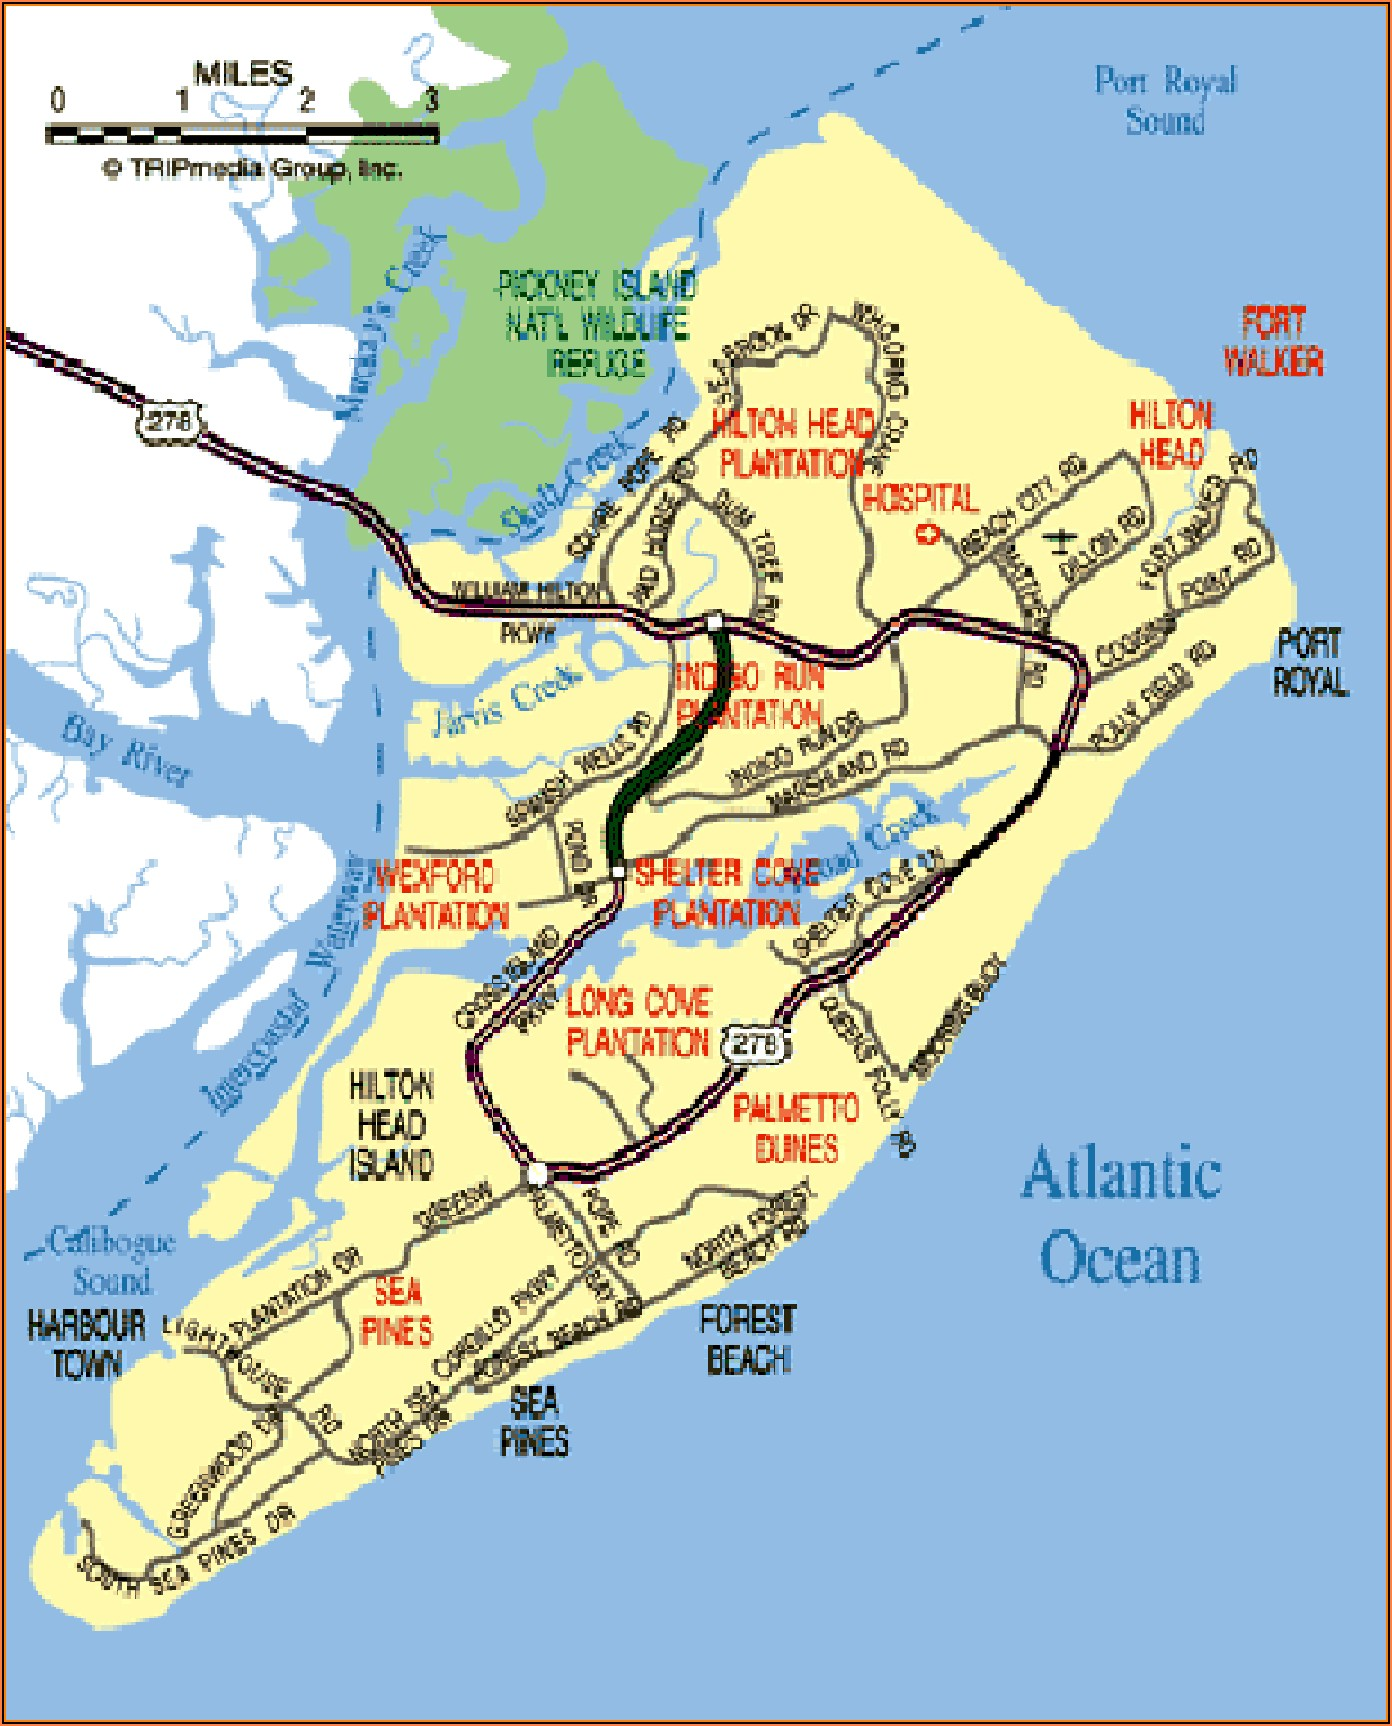 Map Of Hilton Head Island And Surrounding Area